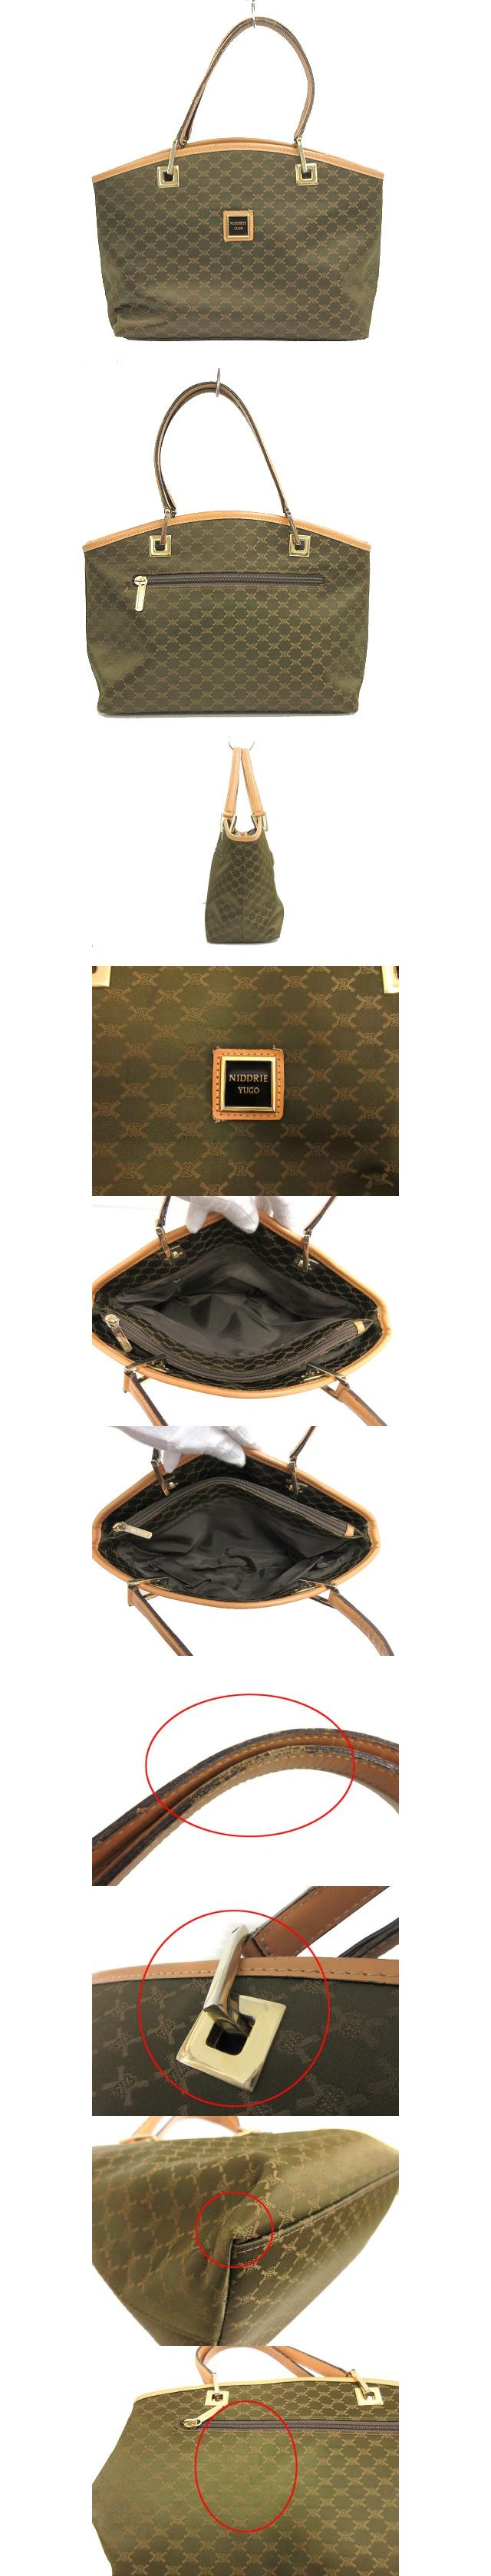 NIDDRIE YUGO ユーゴ ハンドバッグ トート ナイロン レザー 本革 グリーン系 BAG カバン 手提げ鞄